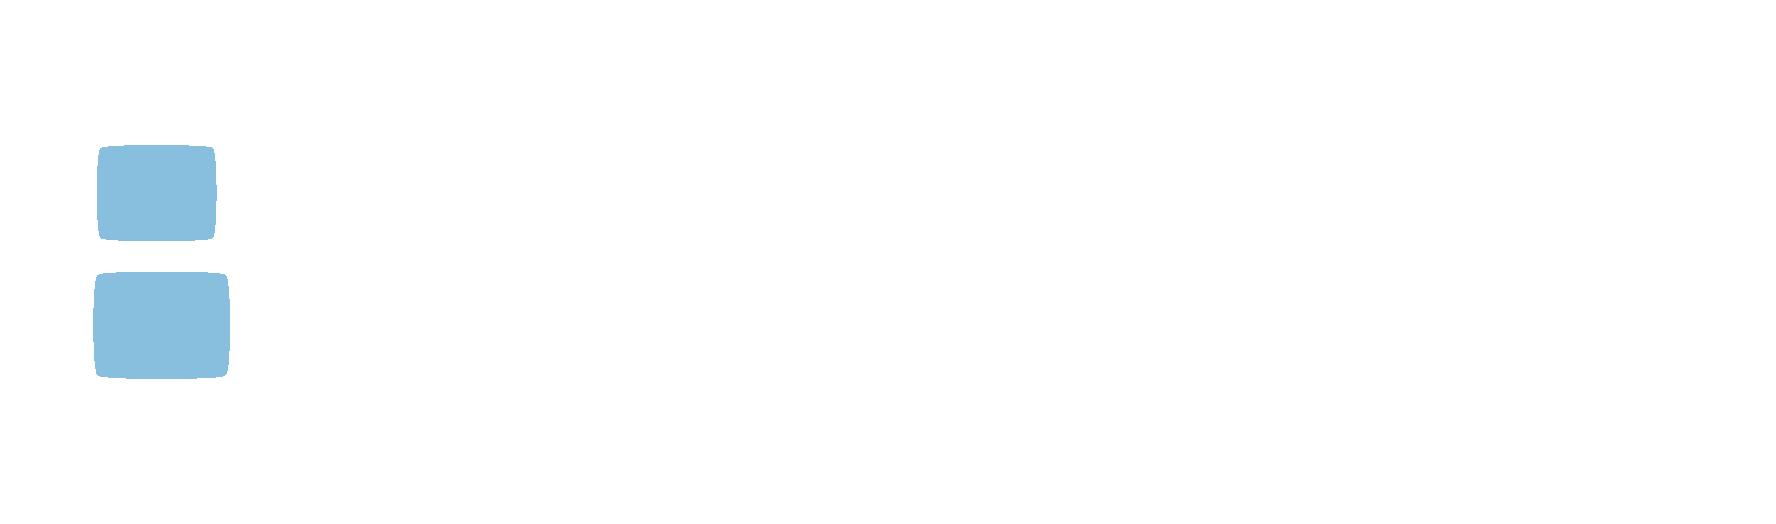 Tagline - Sky White - RGB - BH Logo - Branding-1